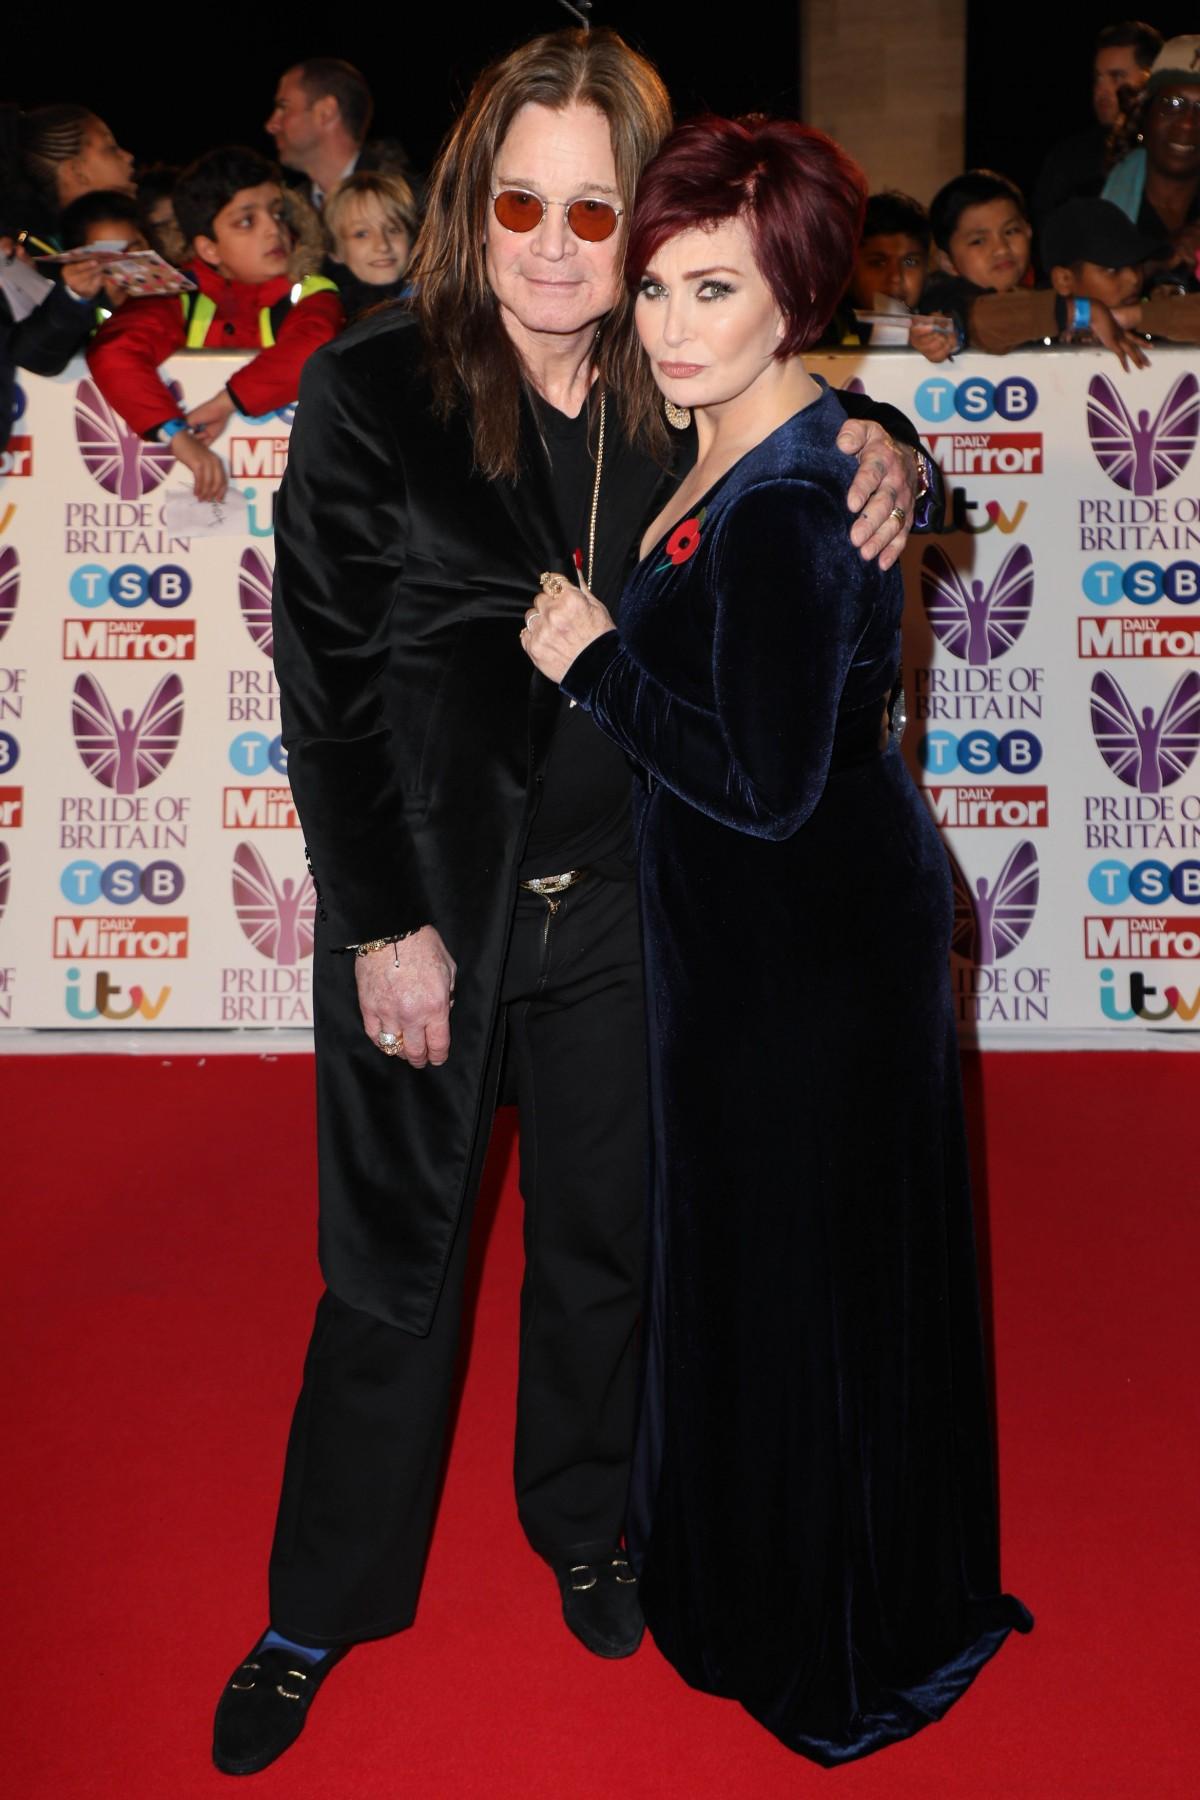 Ozzy Osbourne and Sharon Osbourne arrive for the Pride of Britain Awards, Grosvenor House, London, UK